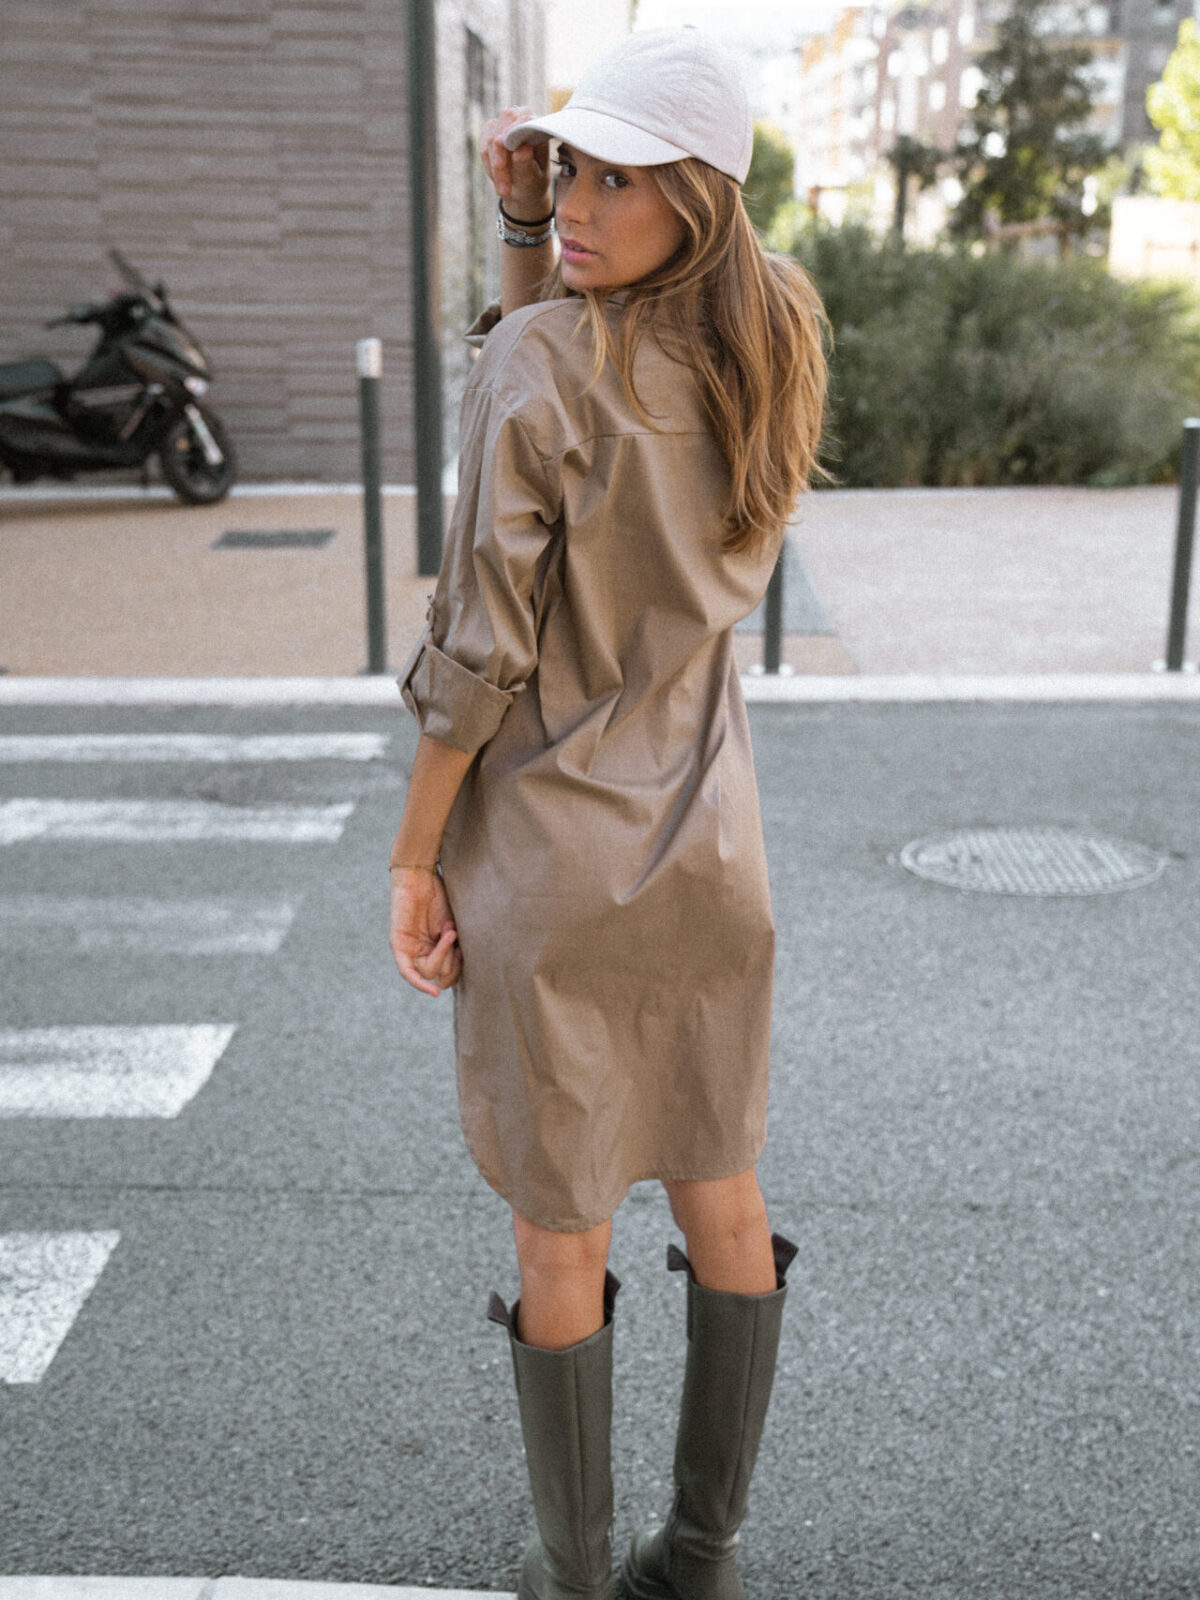 robe-chemise-beige-botte-de-pluie-casquette-femme-gisette-store (3)